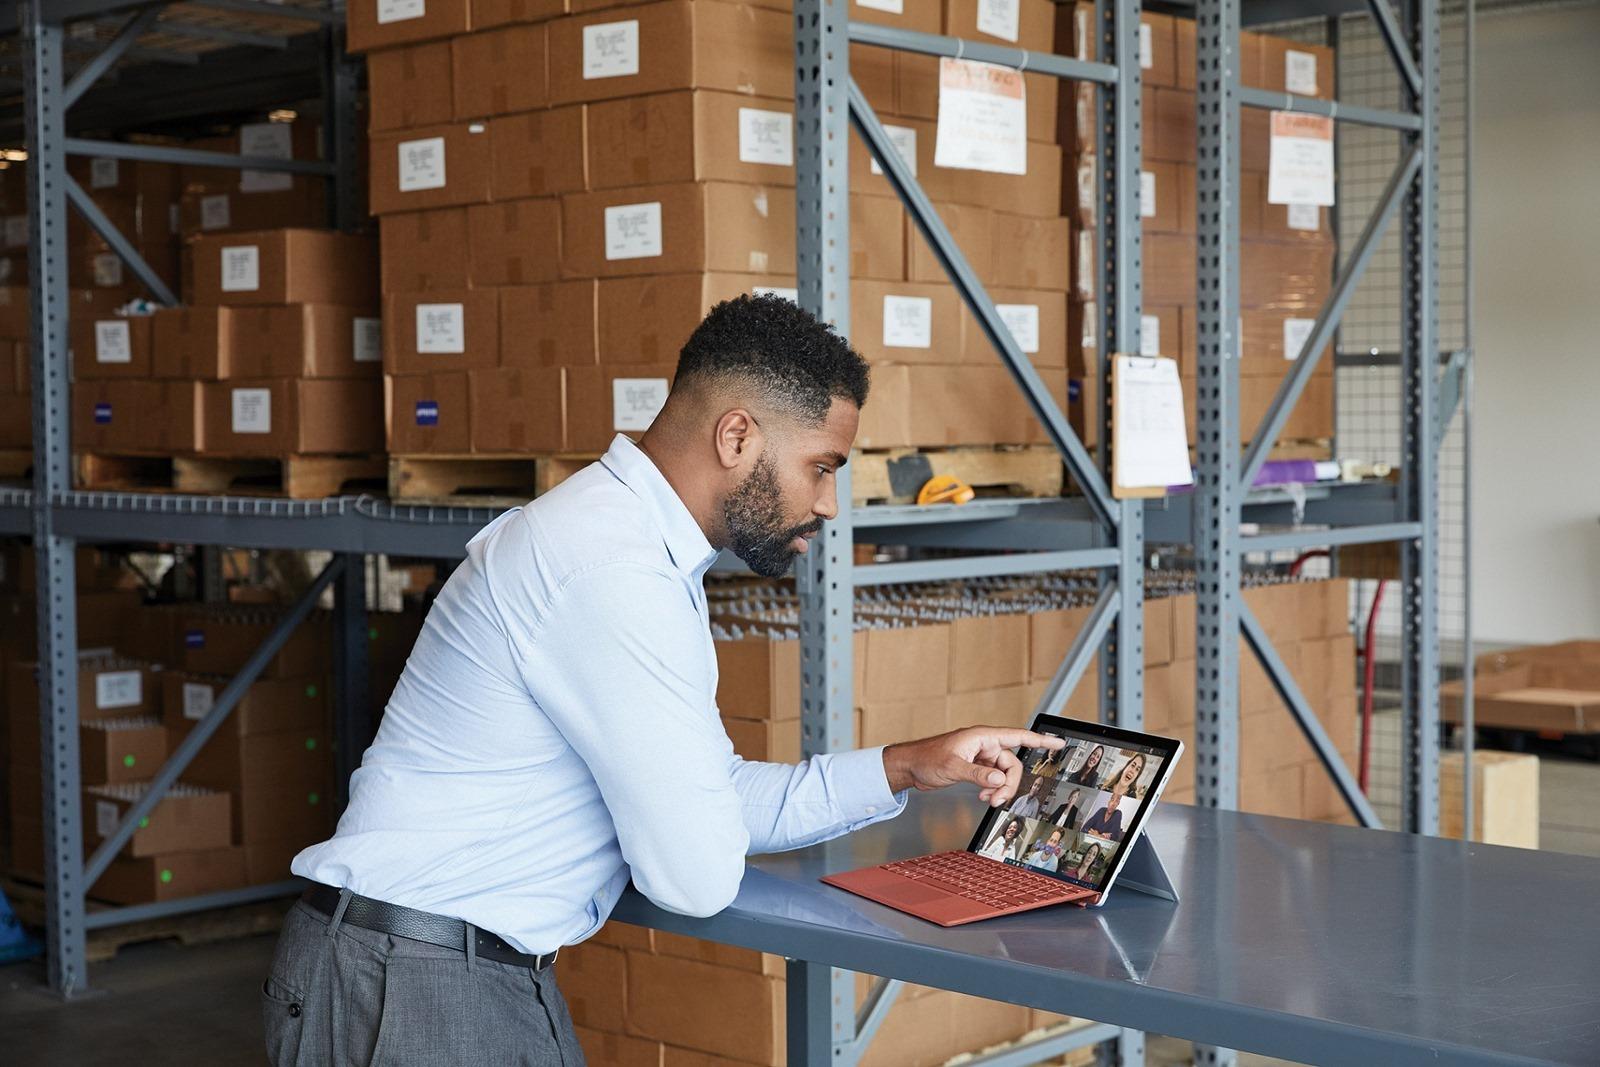 [CES 2021] 微軟發表全新 Surface Pro 7+ 商務版二合一筆電 混合辦公時代新賦能 企業與教育客戶擁有高效能、連線性和安全性 @3C 達人廖阿輝